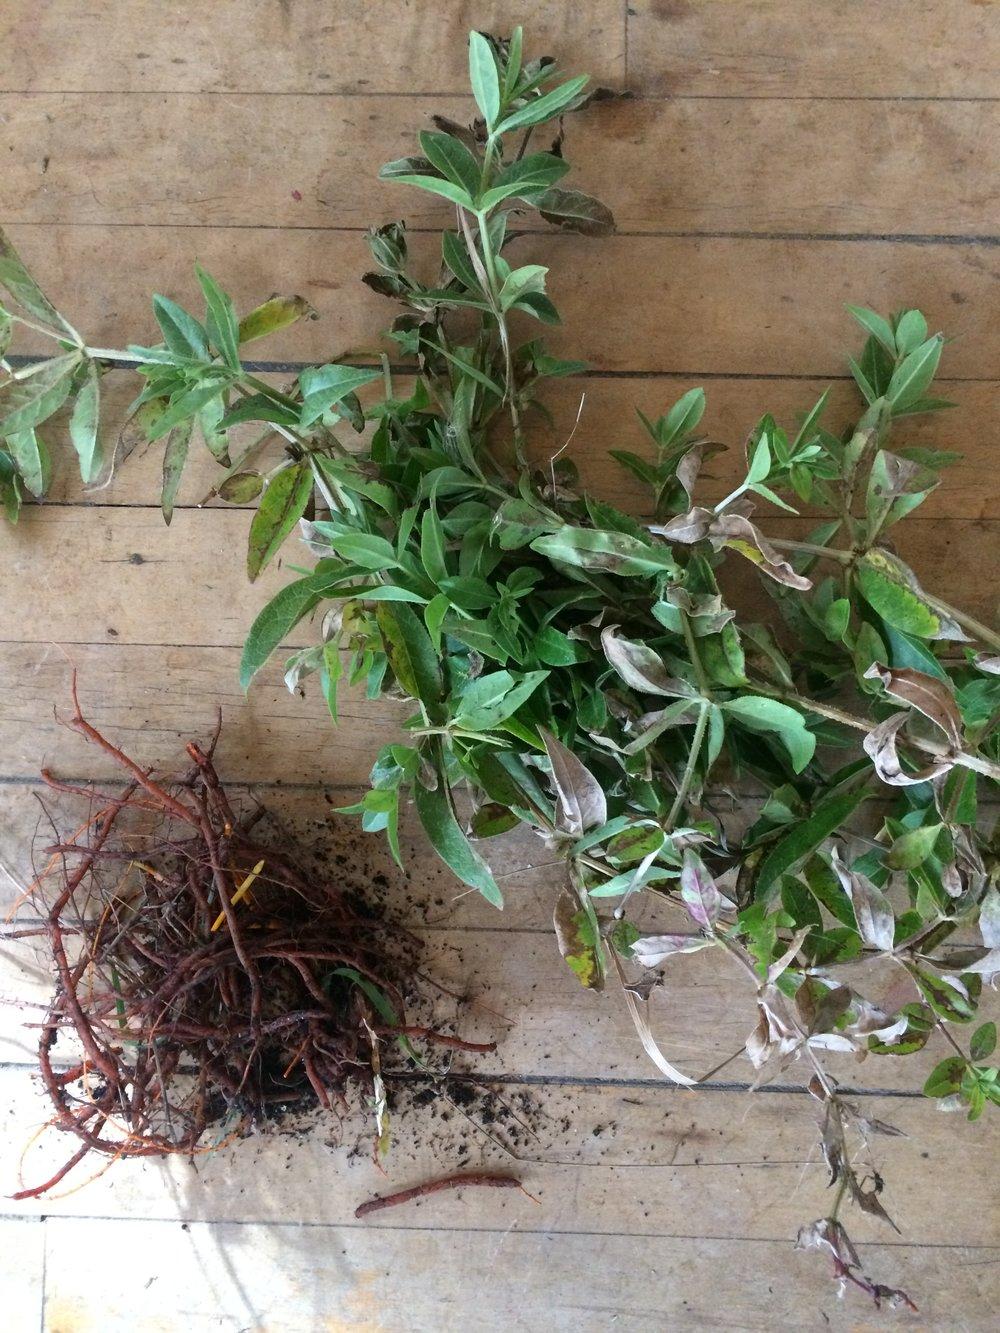 Rubia tinctorum, Madder root.